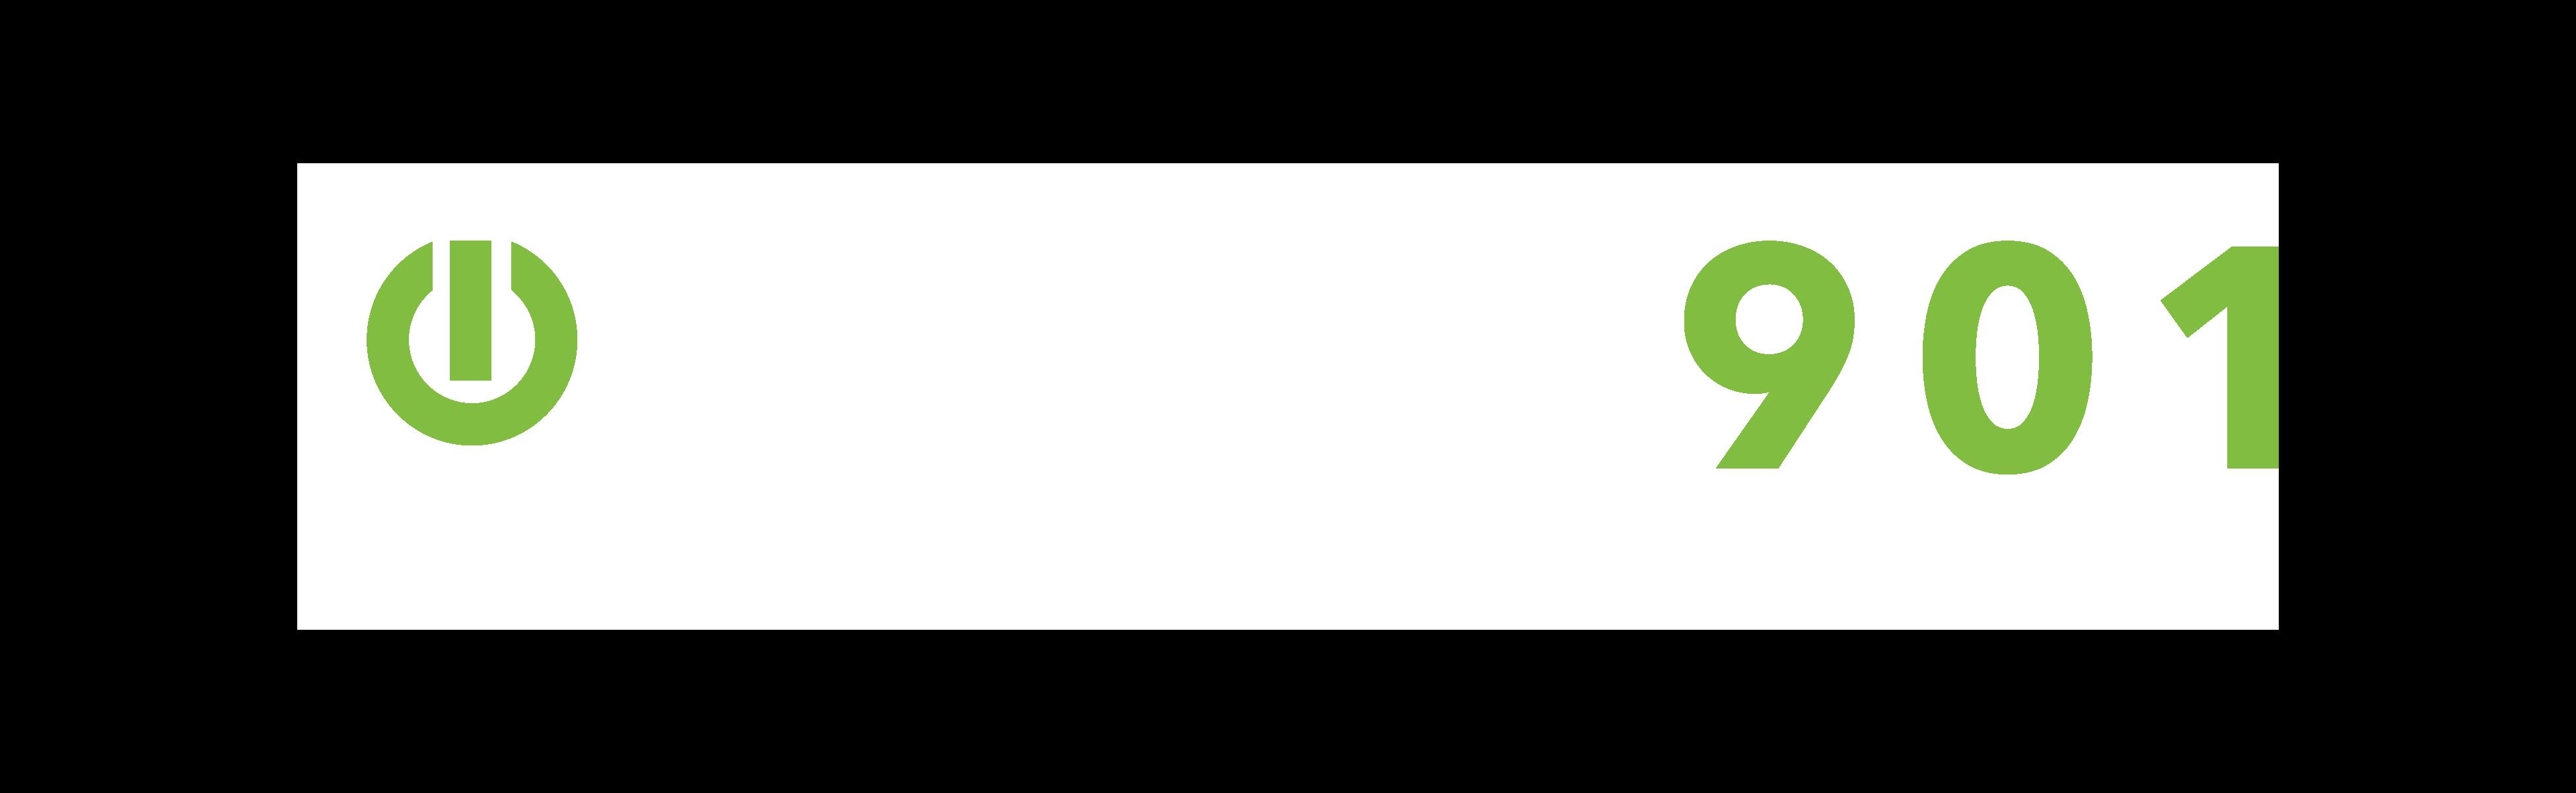 TECH901-reverse.png